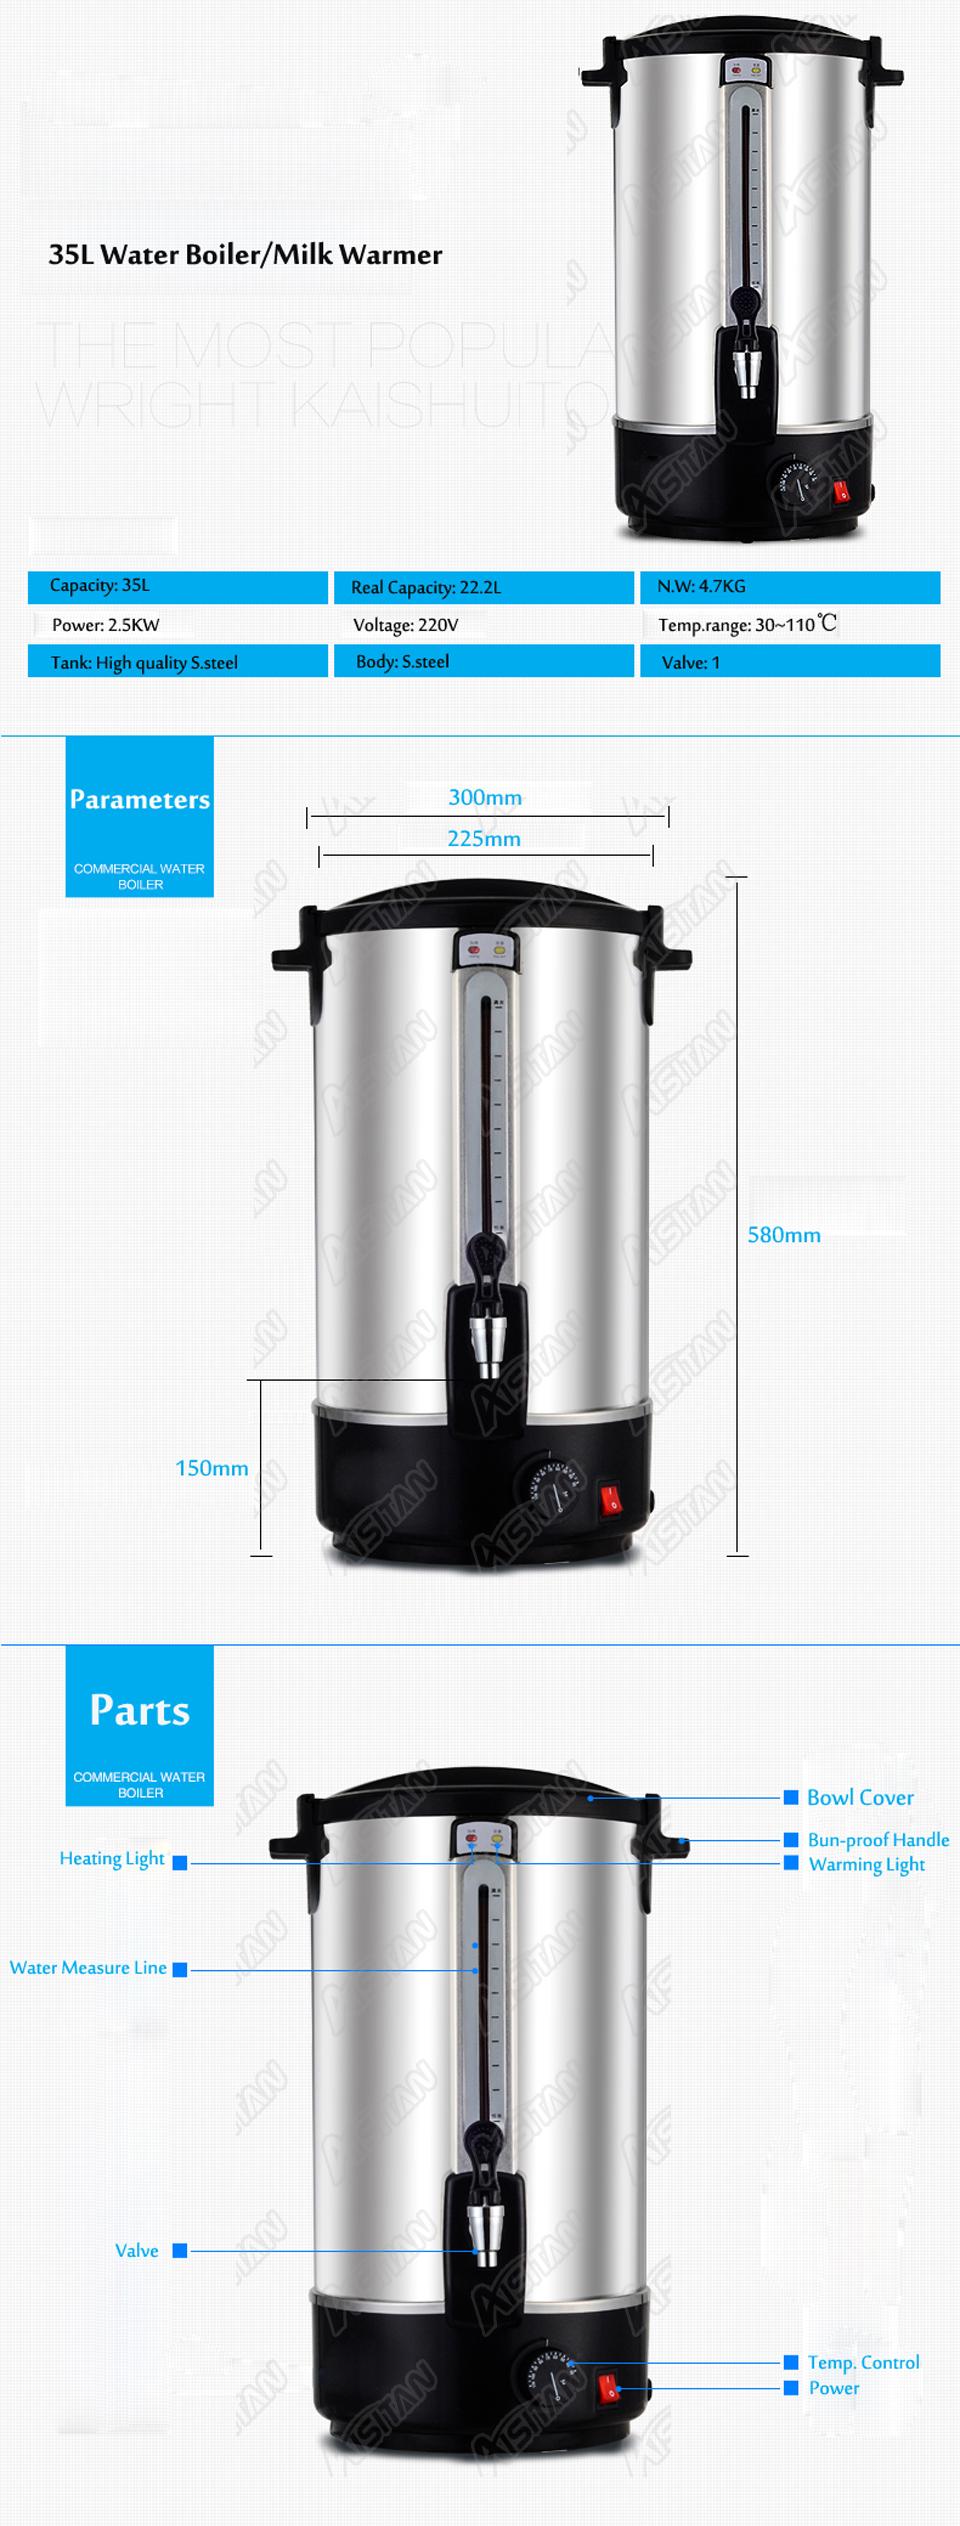 HL25A 35L Commercial Well-Saled Hot Water Dispenser/Boiler Machine ...